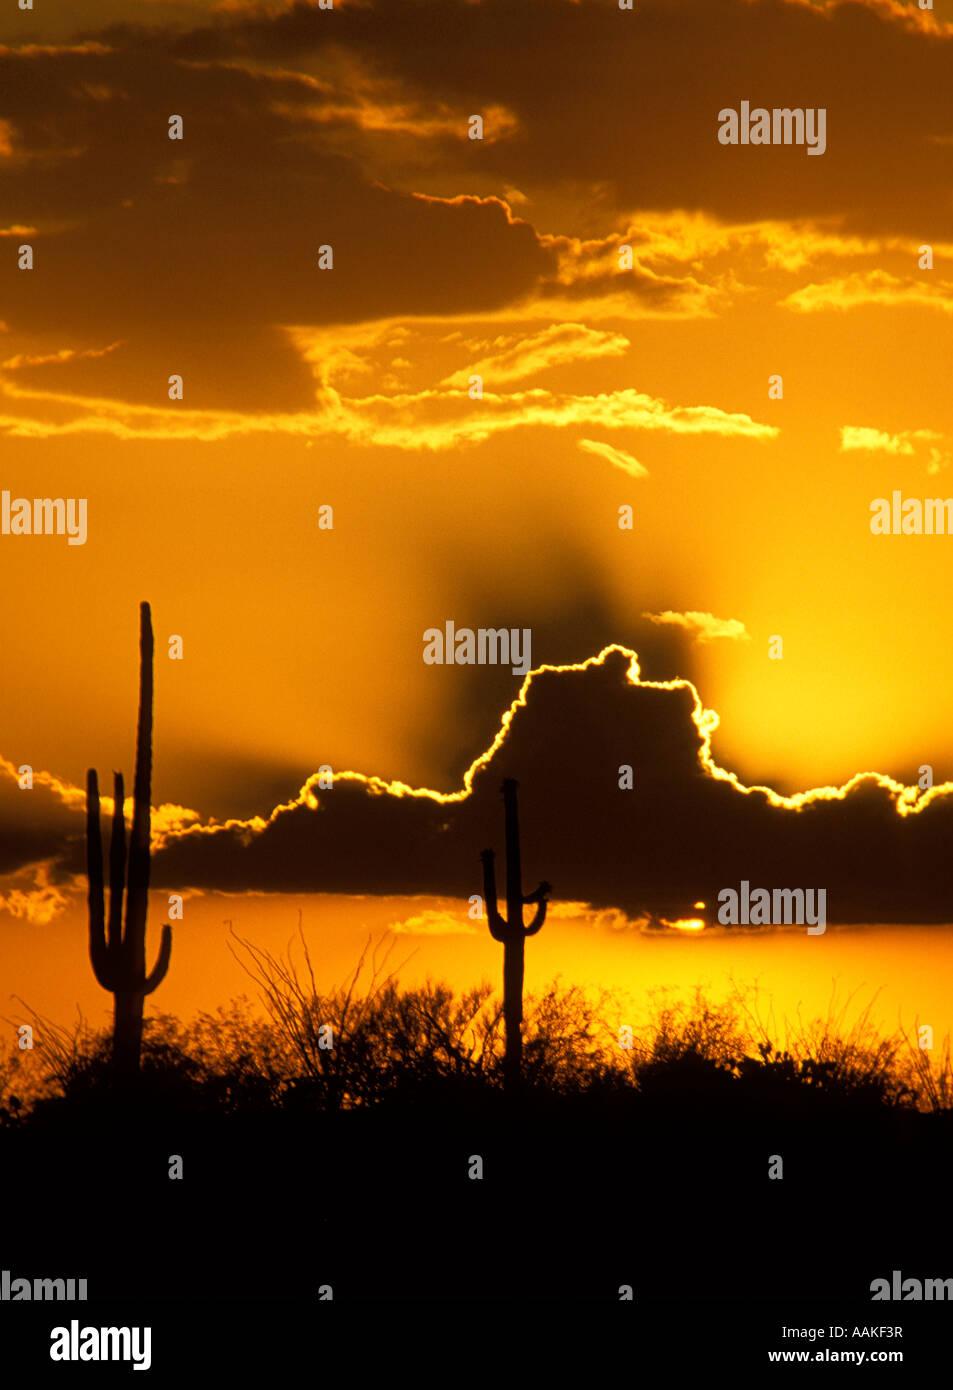 Dramatischen Sonnenuntergang im Saguaro National Park East Side Tucson Arizona Stockbild